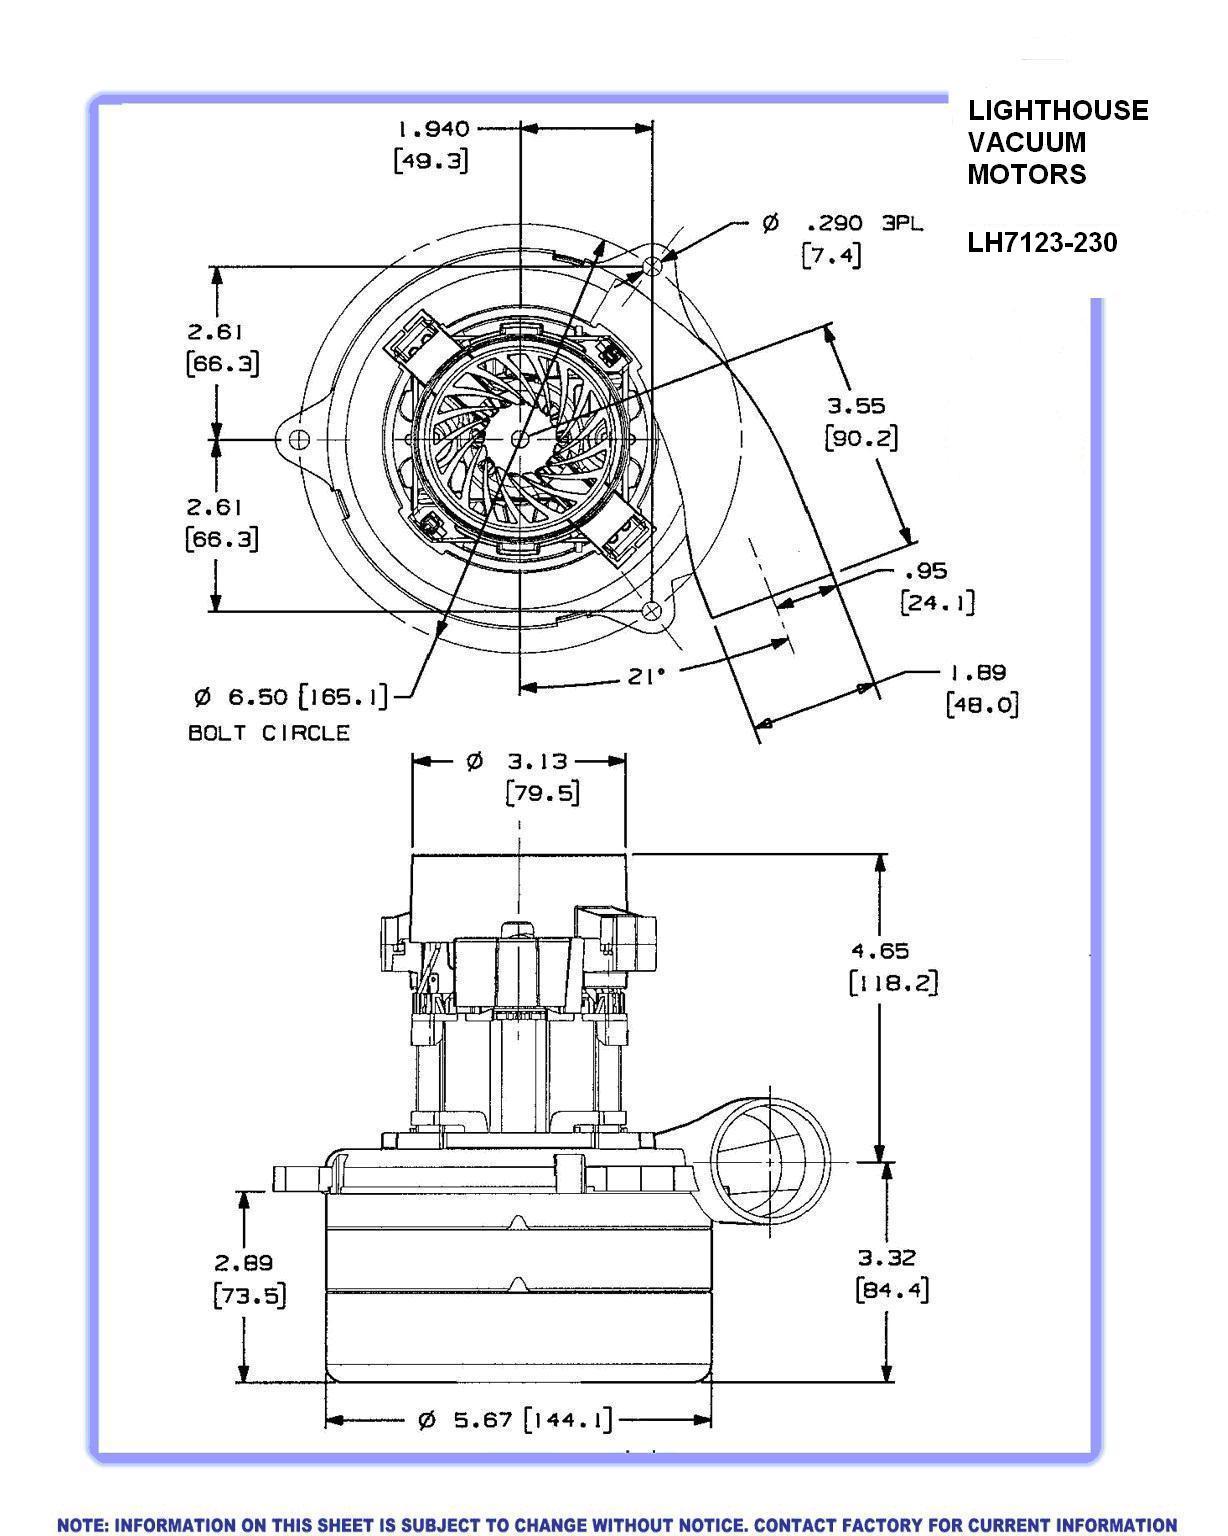 rug doctor wiring diagram Collection-Rug Doctor Parts Diagram Fresh Shopbot Vacuum Motors 14-j